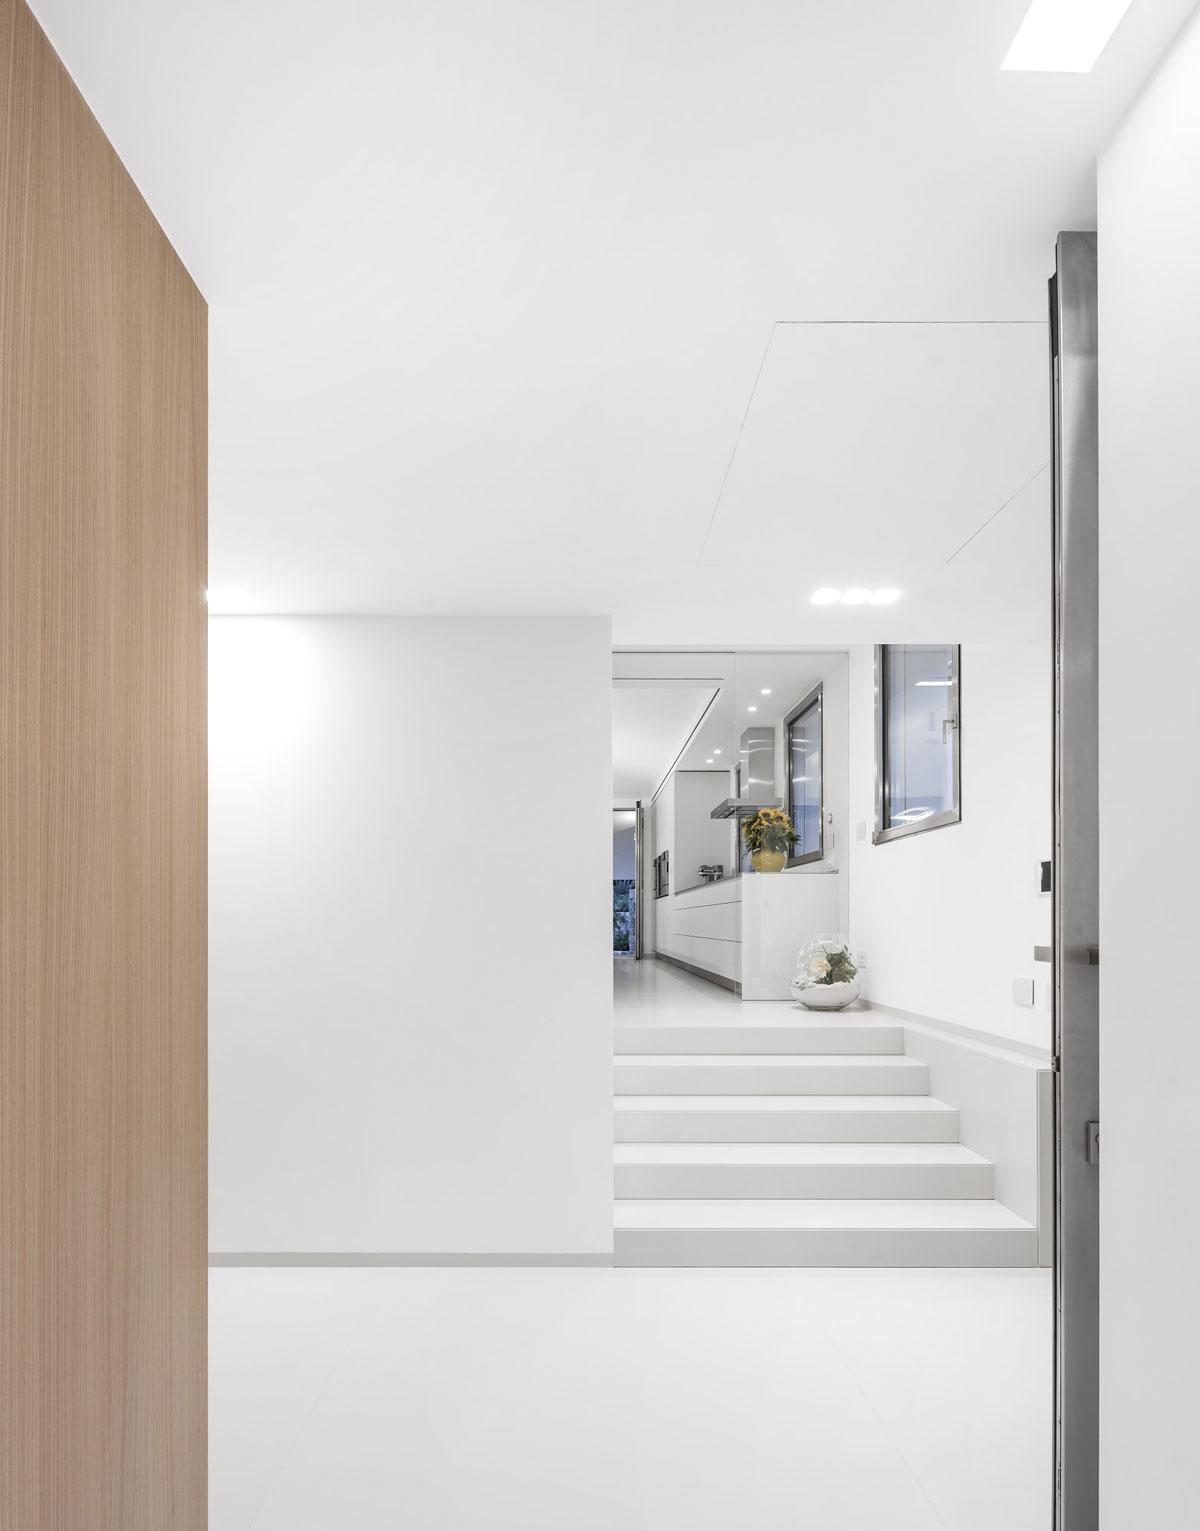 biele kamenné schody